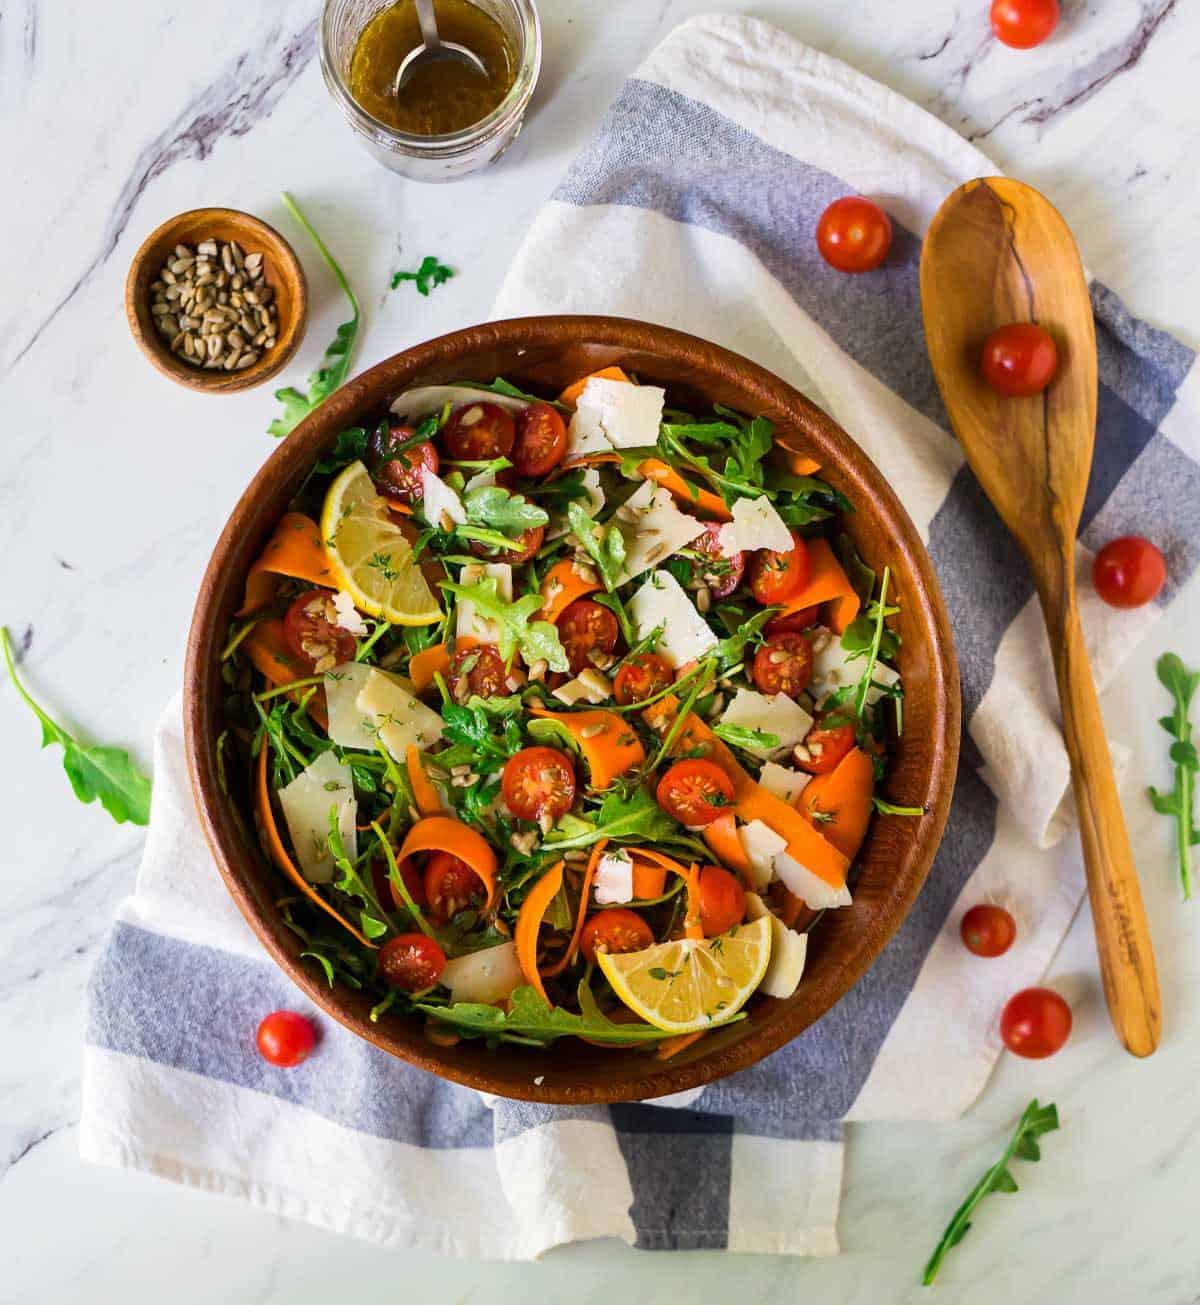 Arugula Salad {With Lemon Balsamic Dressing!} - WellPlated.com